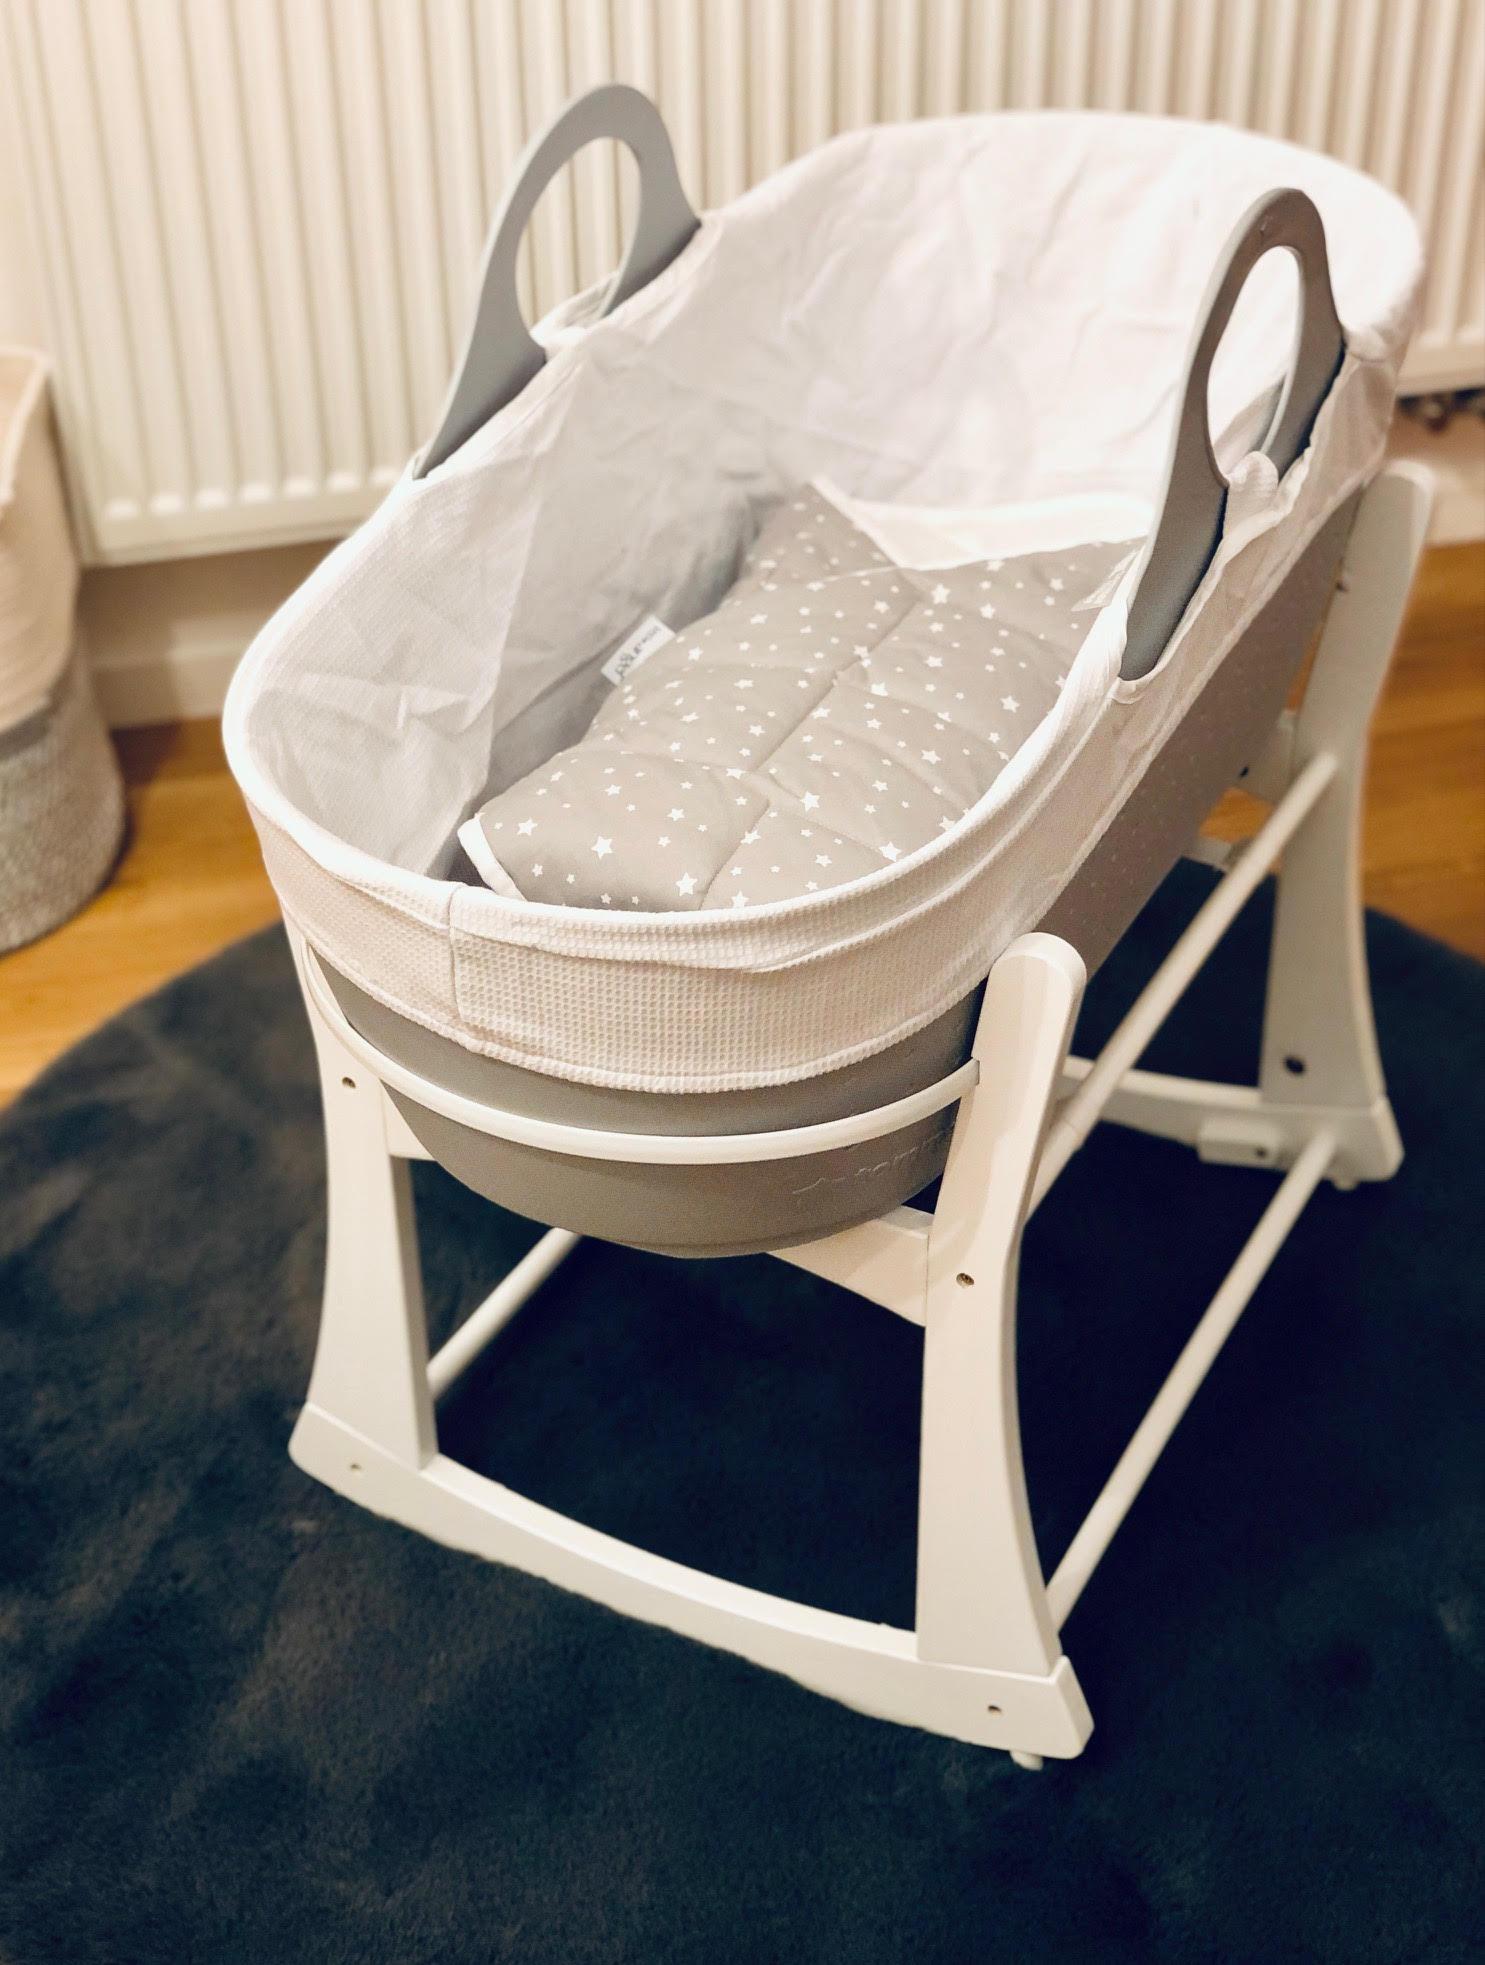 Výbavička od Tommee Tippee - recenze košíku na spaní, dudlíku, koše Twist and Click a lahviček